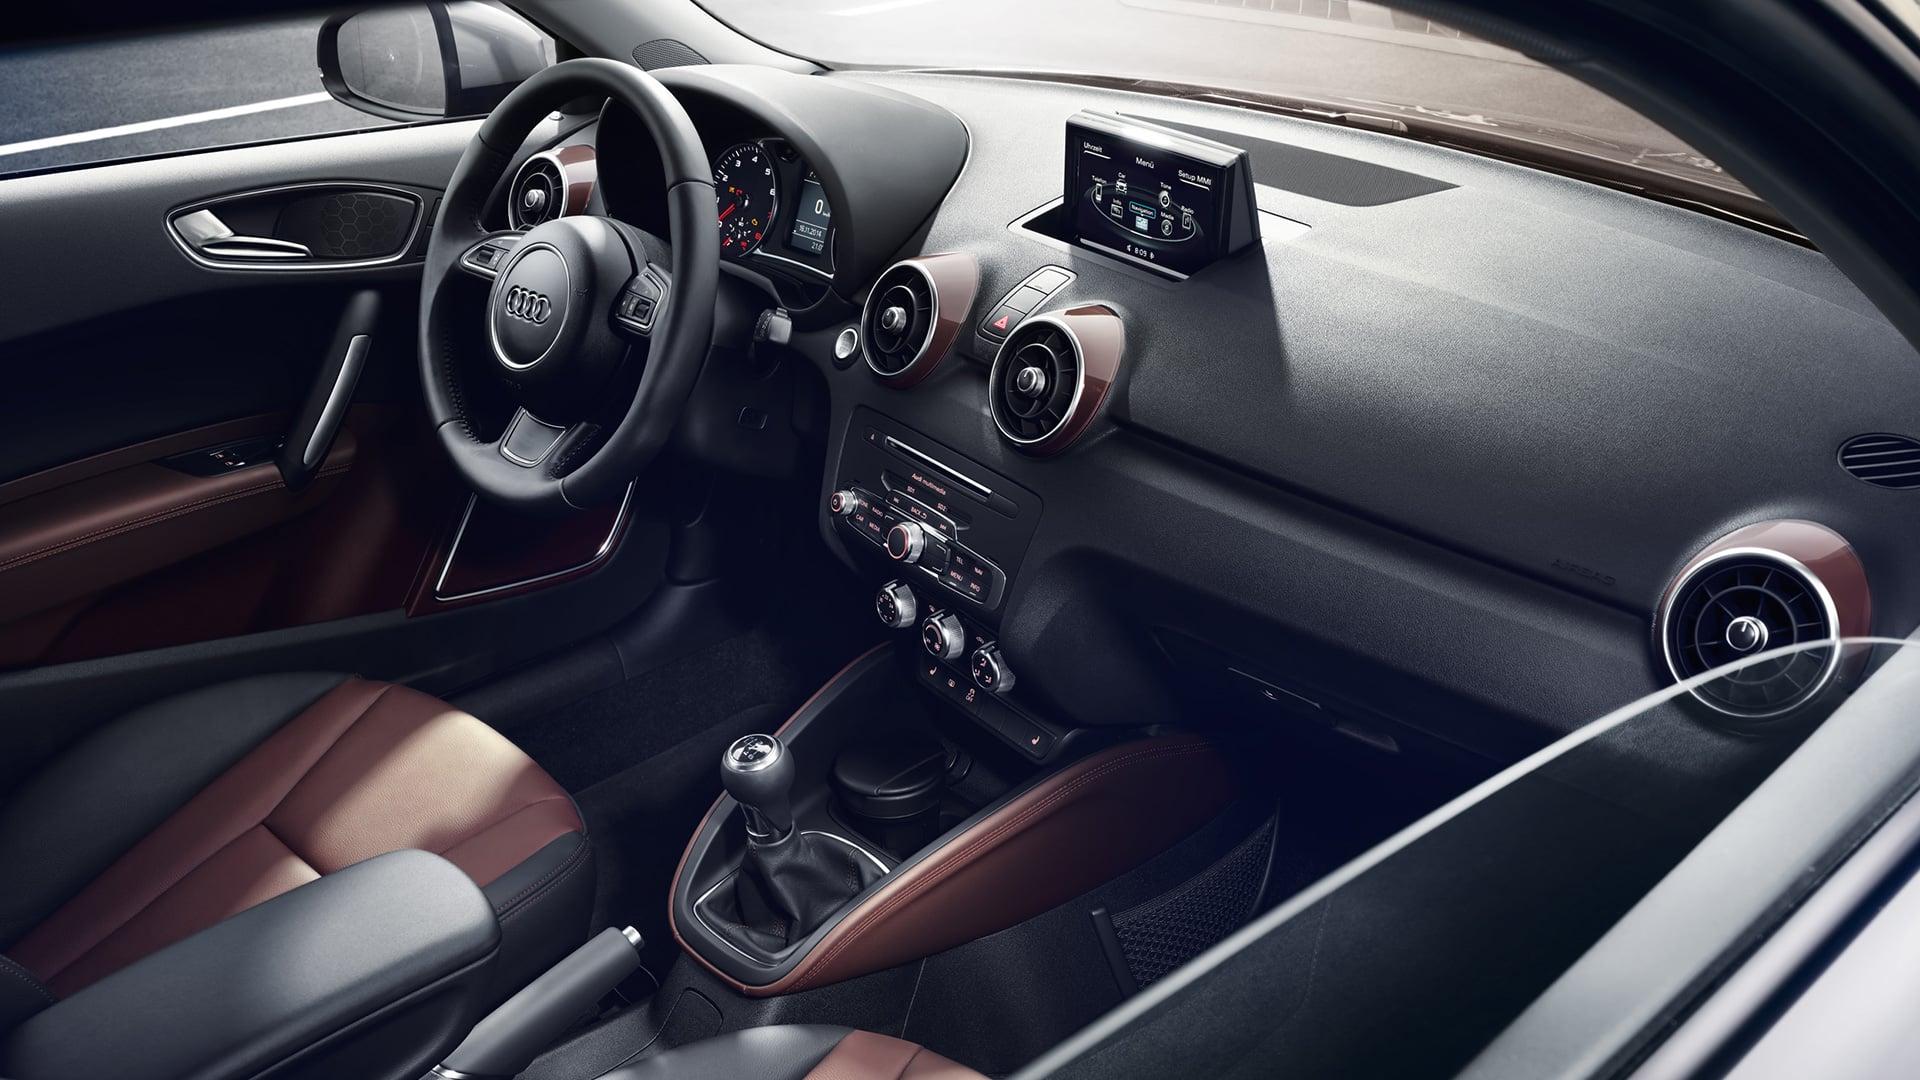 Audi a1 groots idee compact uitgevoerd audi for Interieur audi a1